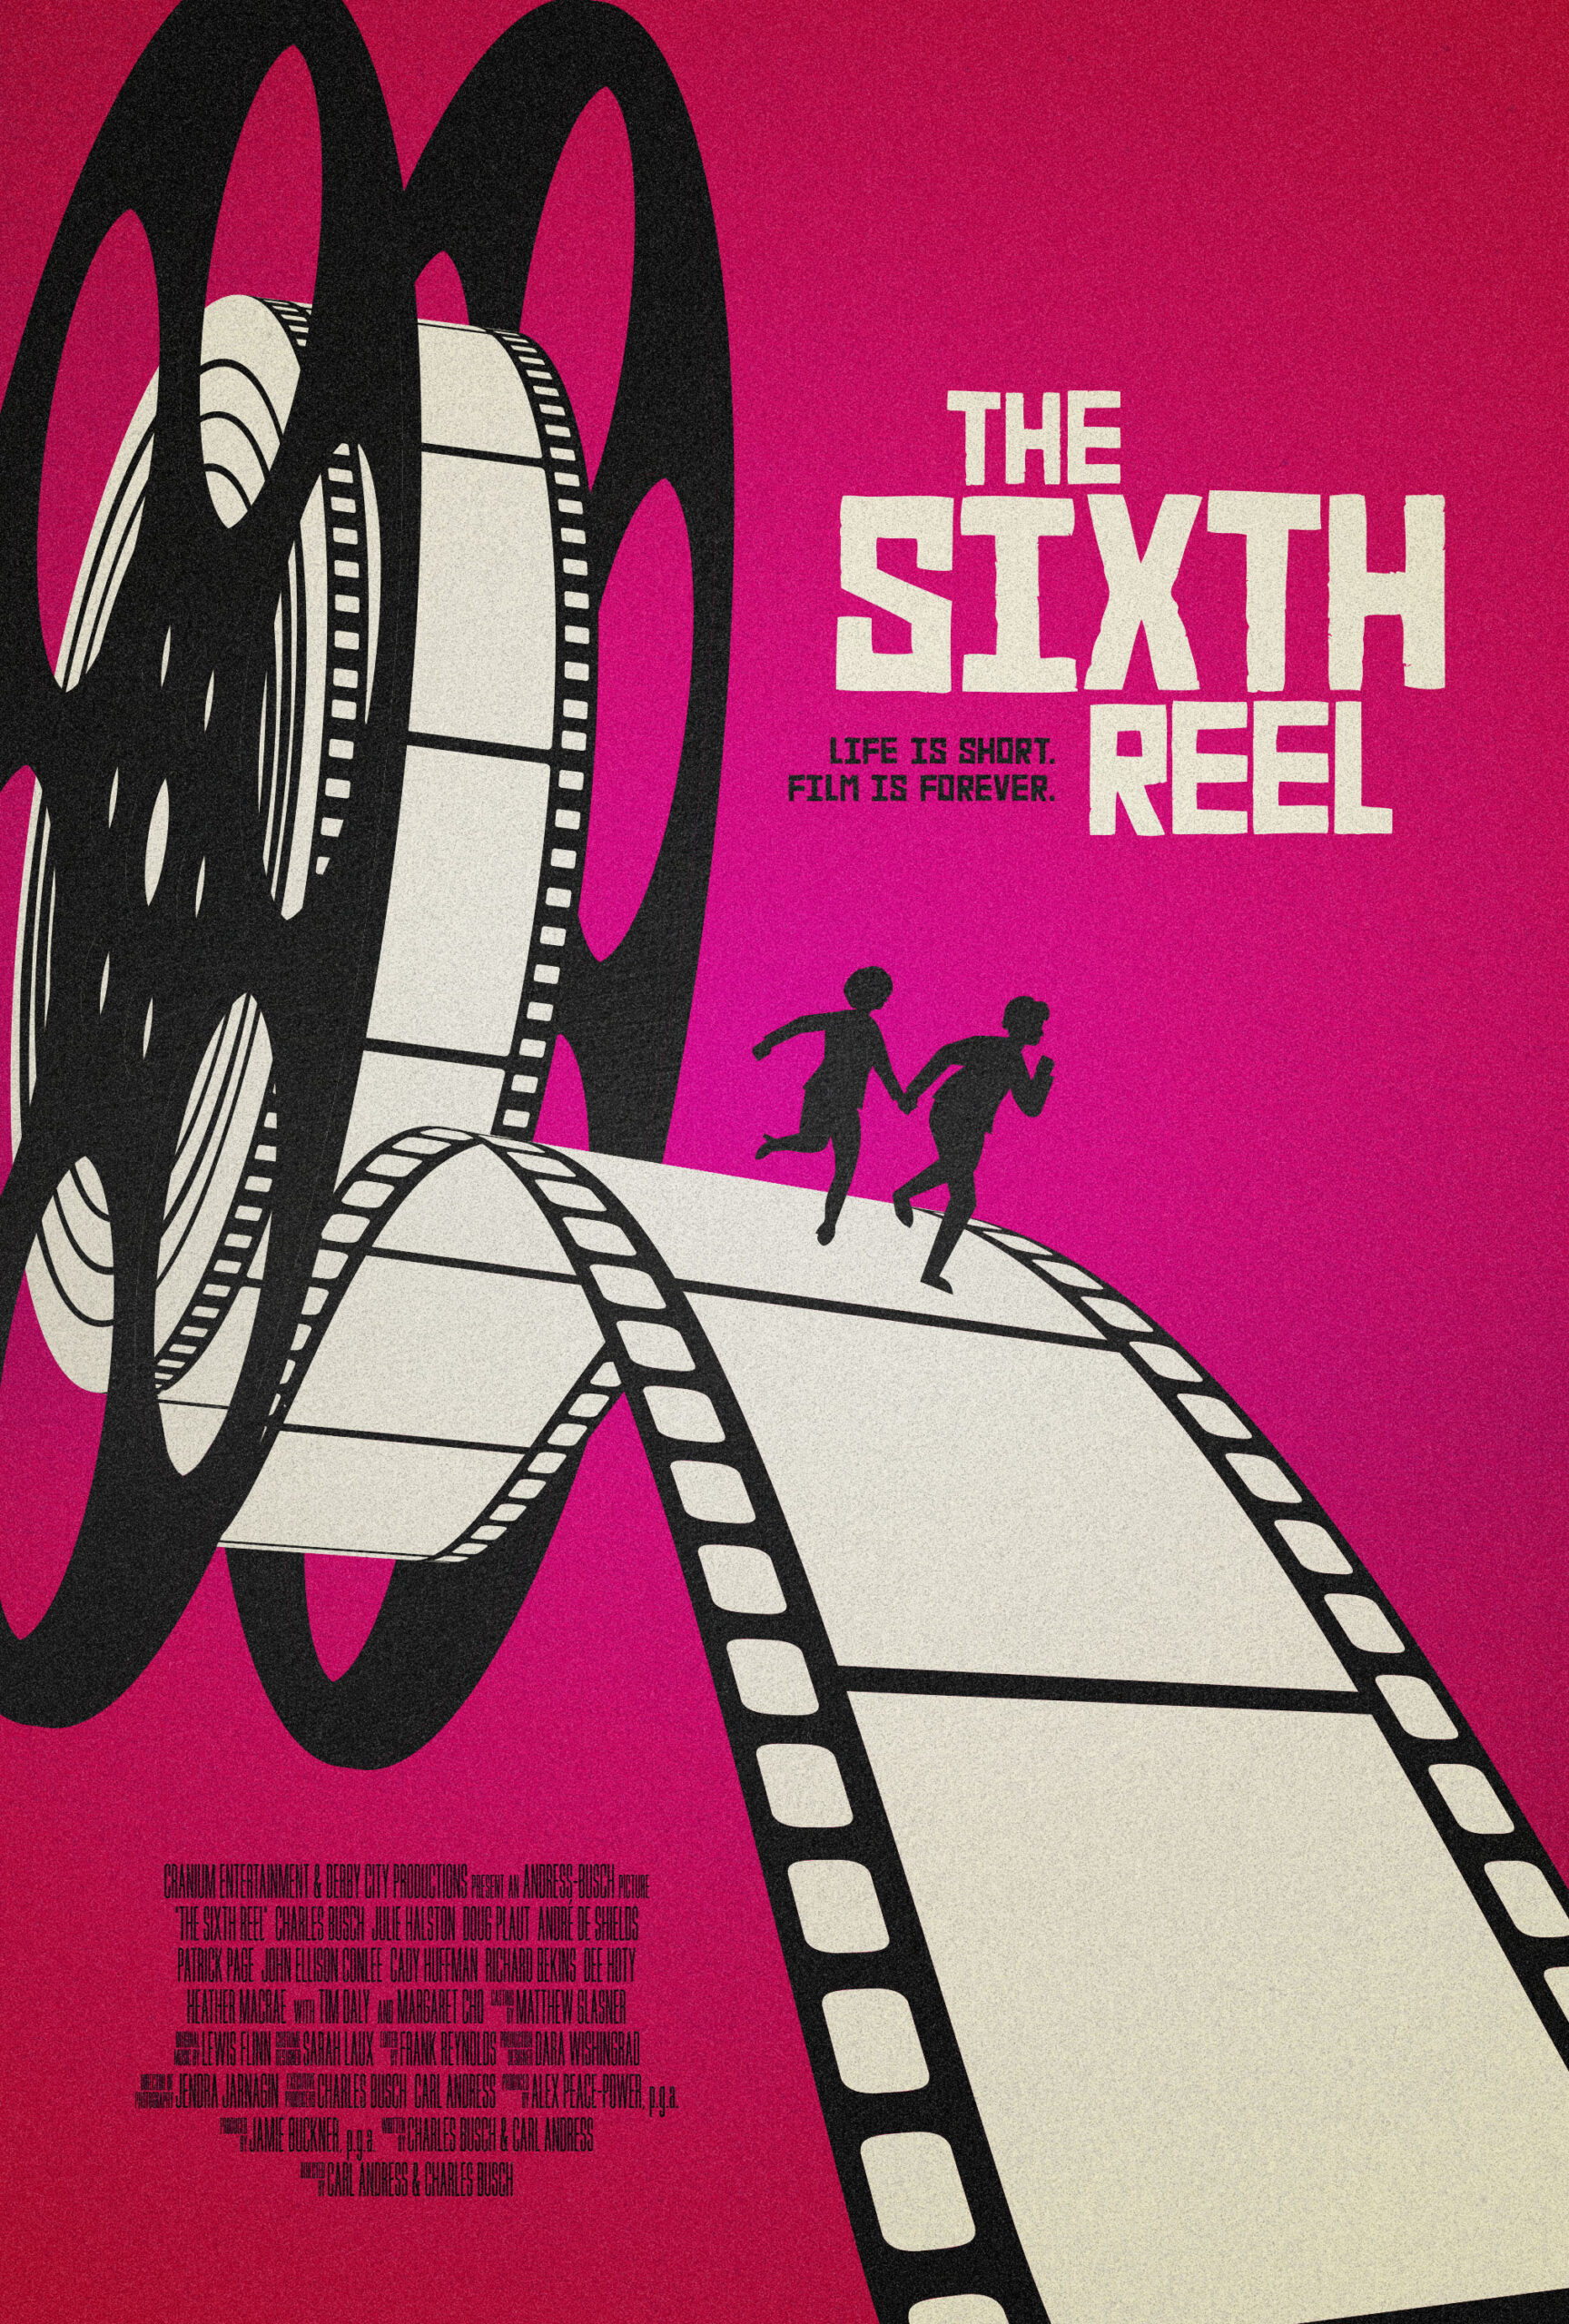 Sixth Reel poster